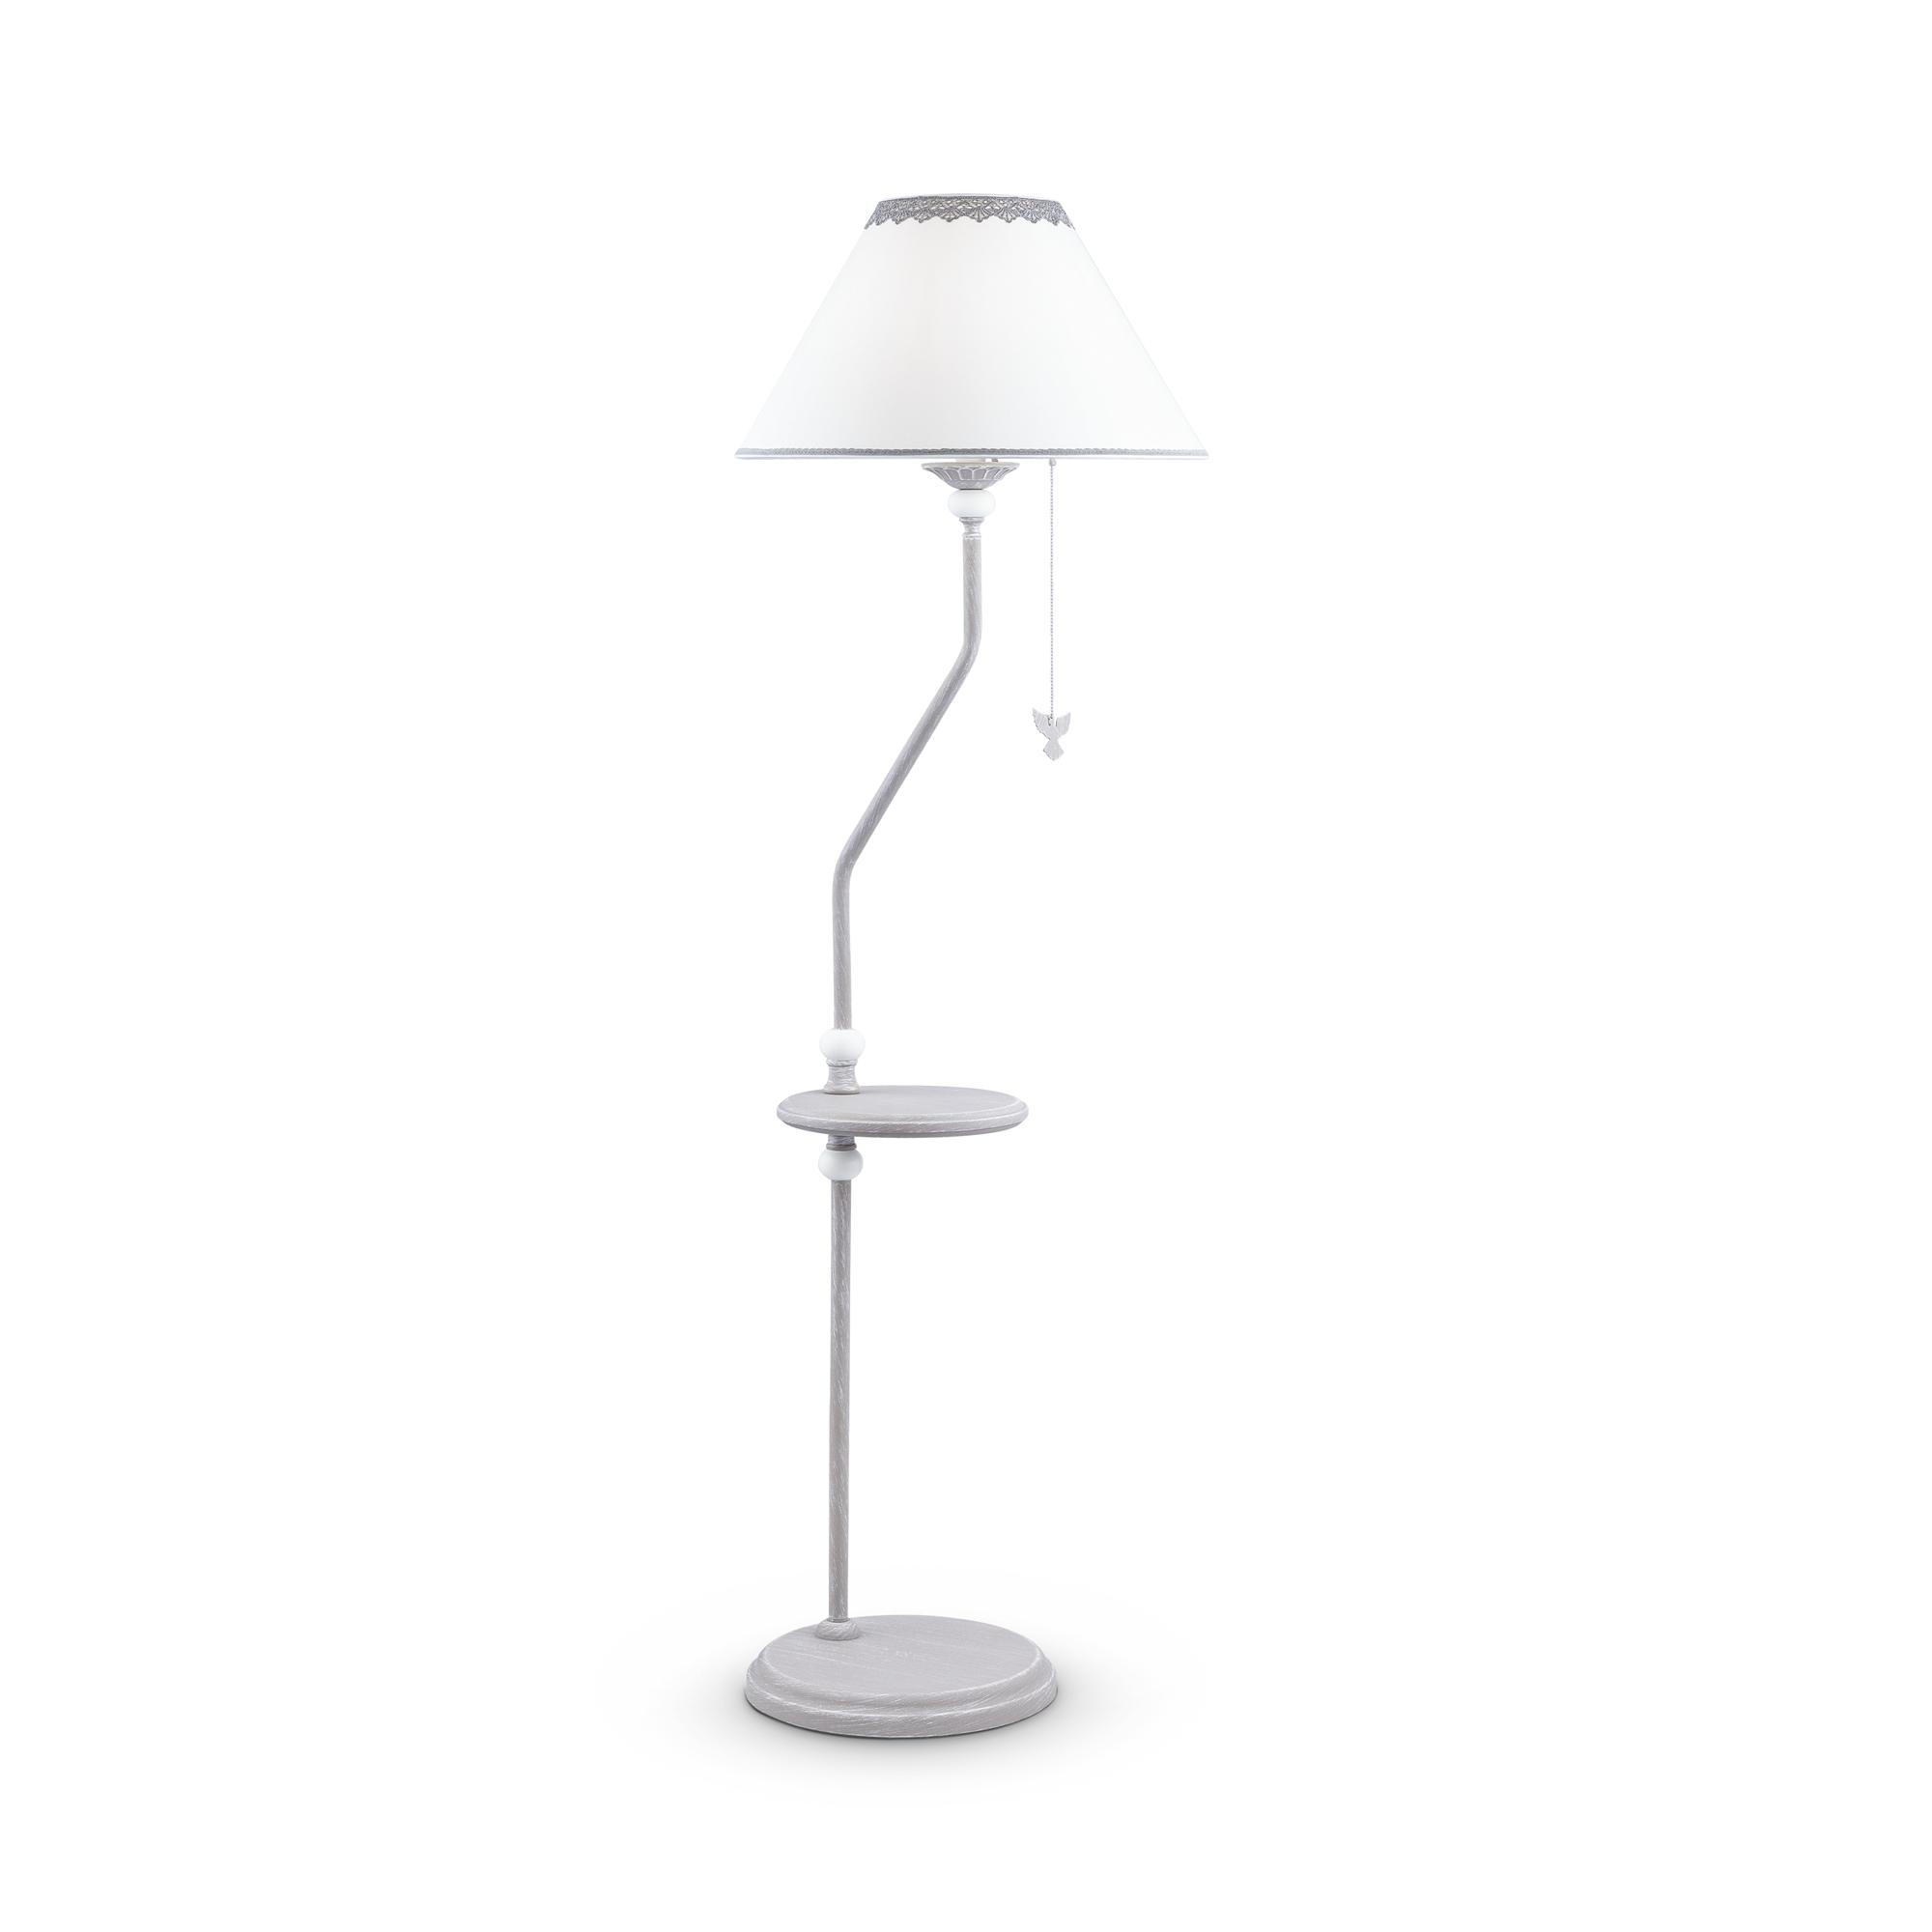 Торшер со столиком Maytoni Classic Elegant Bouquet ARM023-FL-01-S, 1xE27x40W, серый, металл, текстиль - фото 2